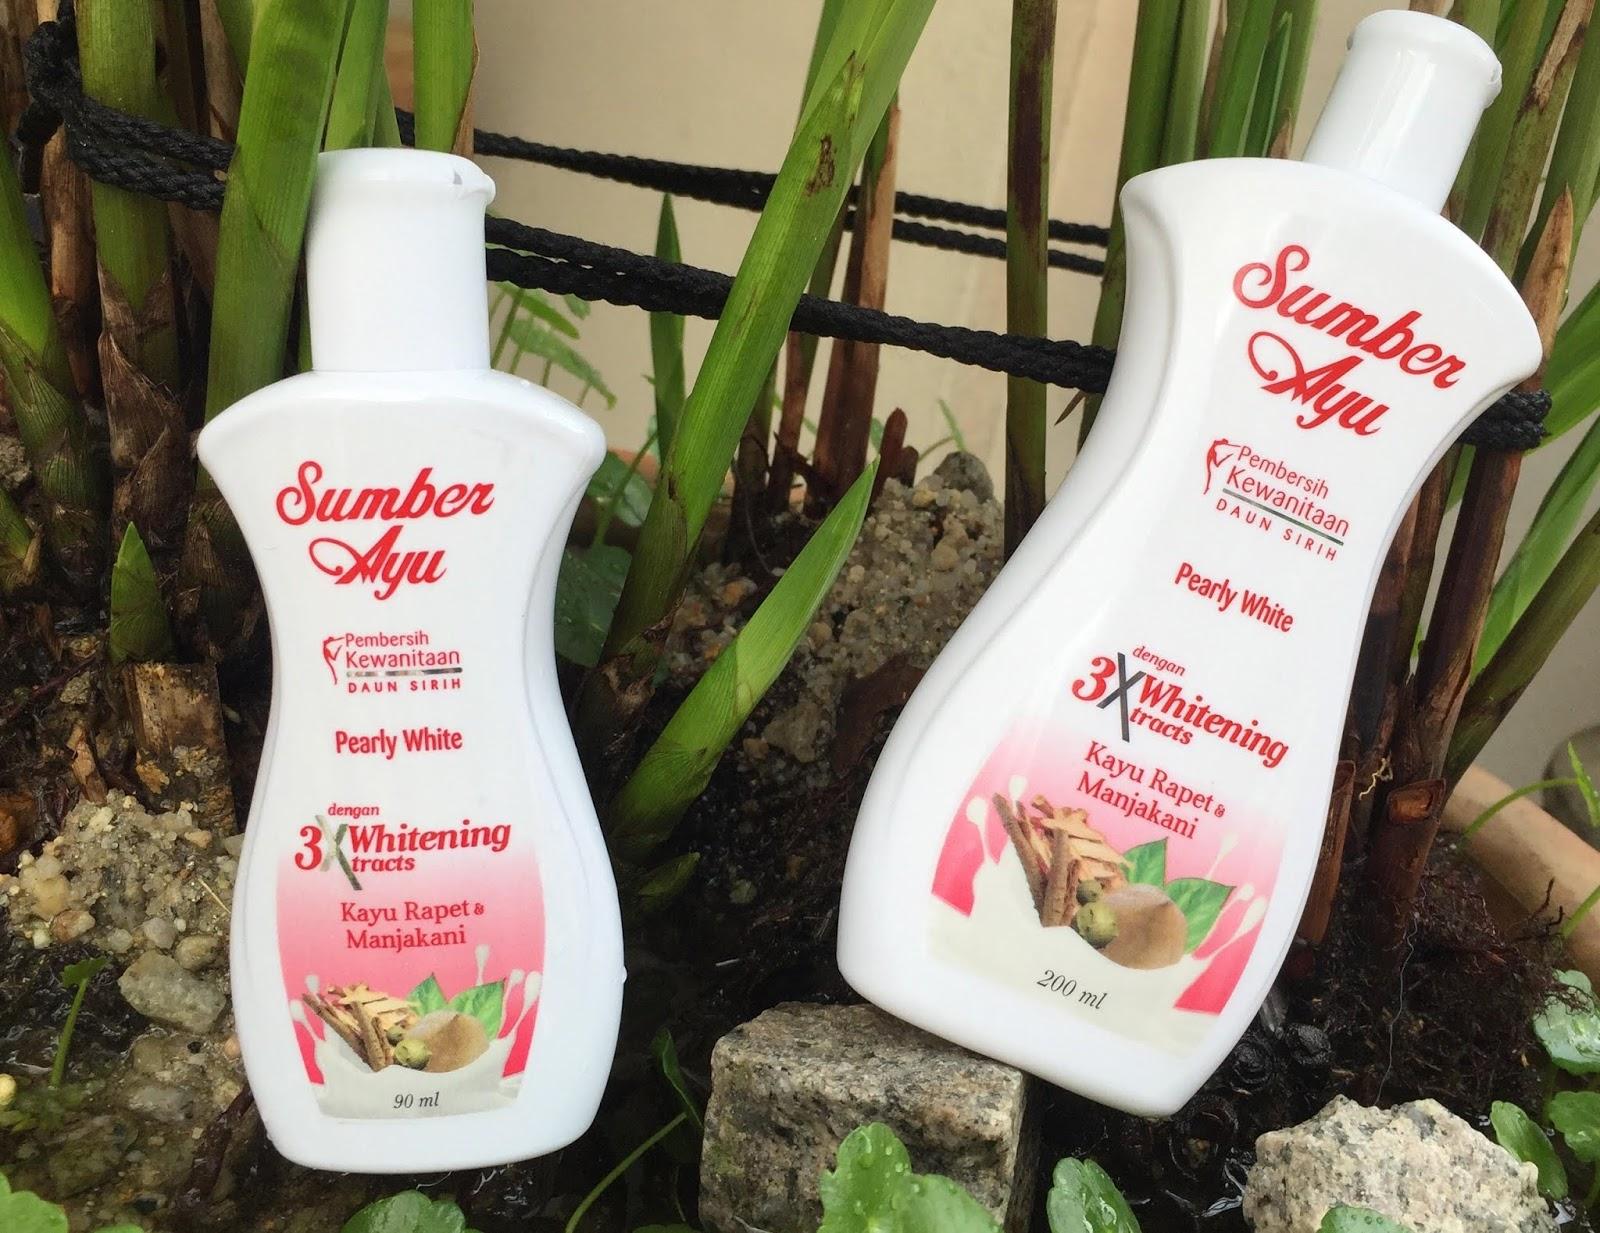 pencuci bahagian intim wanita, sumber ayu, produk wanita